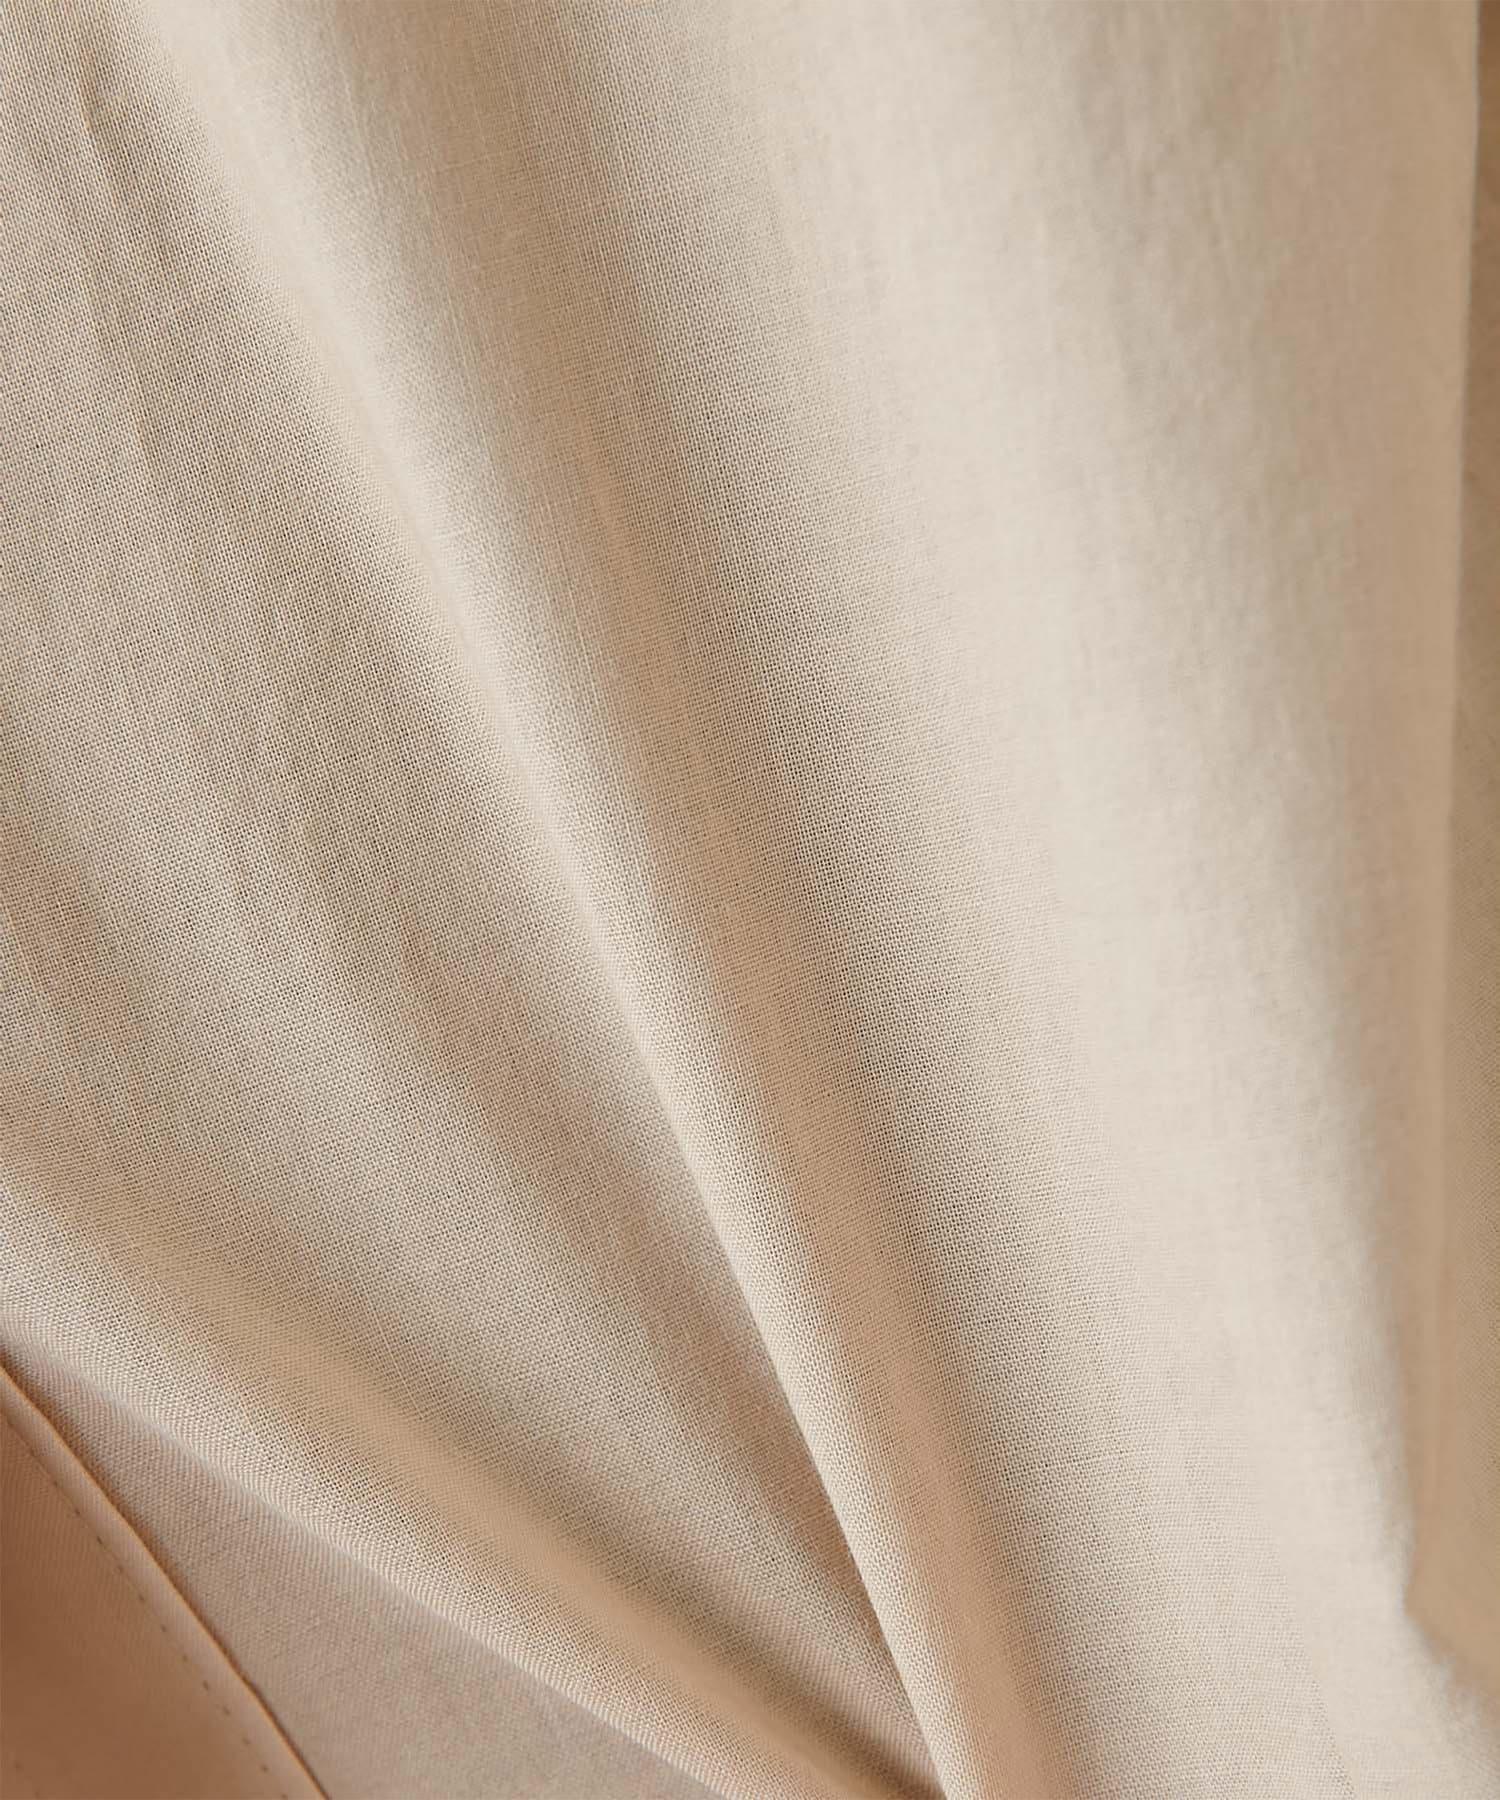 GALLARDAGALANTE(ガリャルダガランテ) スリーブツイストブラウス【オンラインストア限定商品】